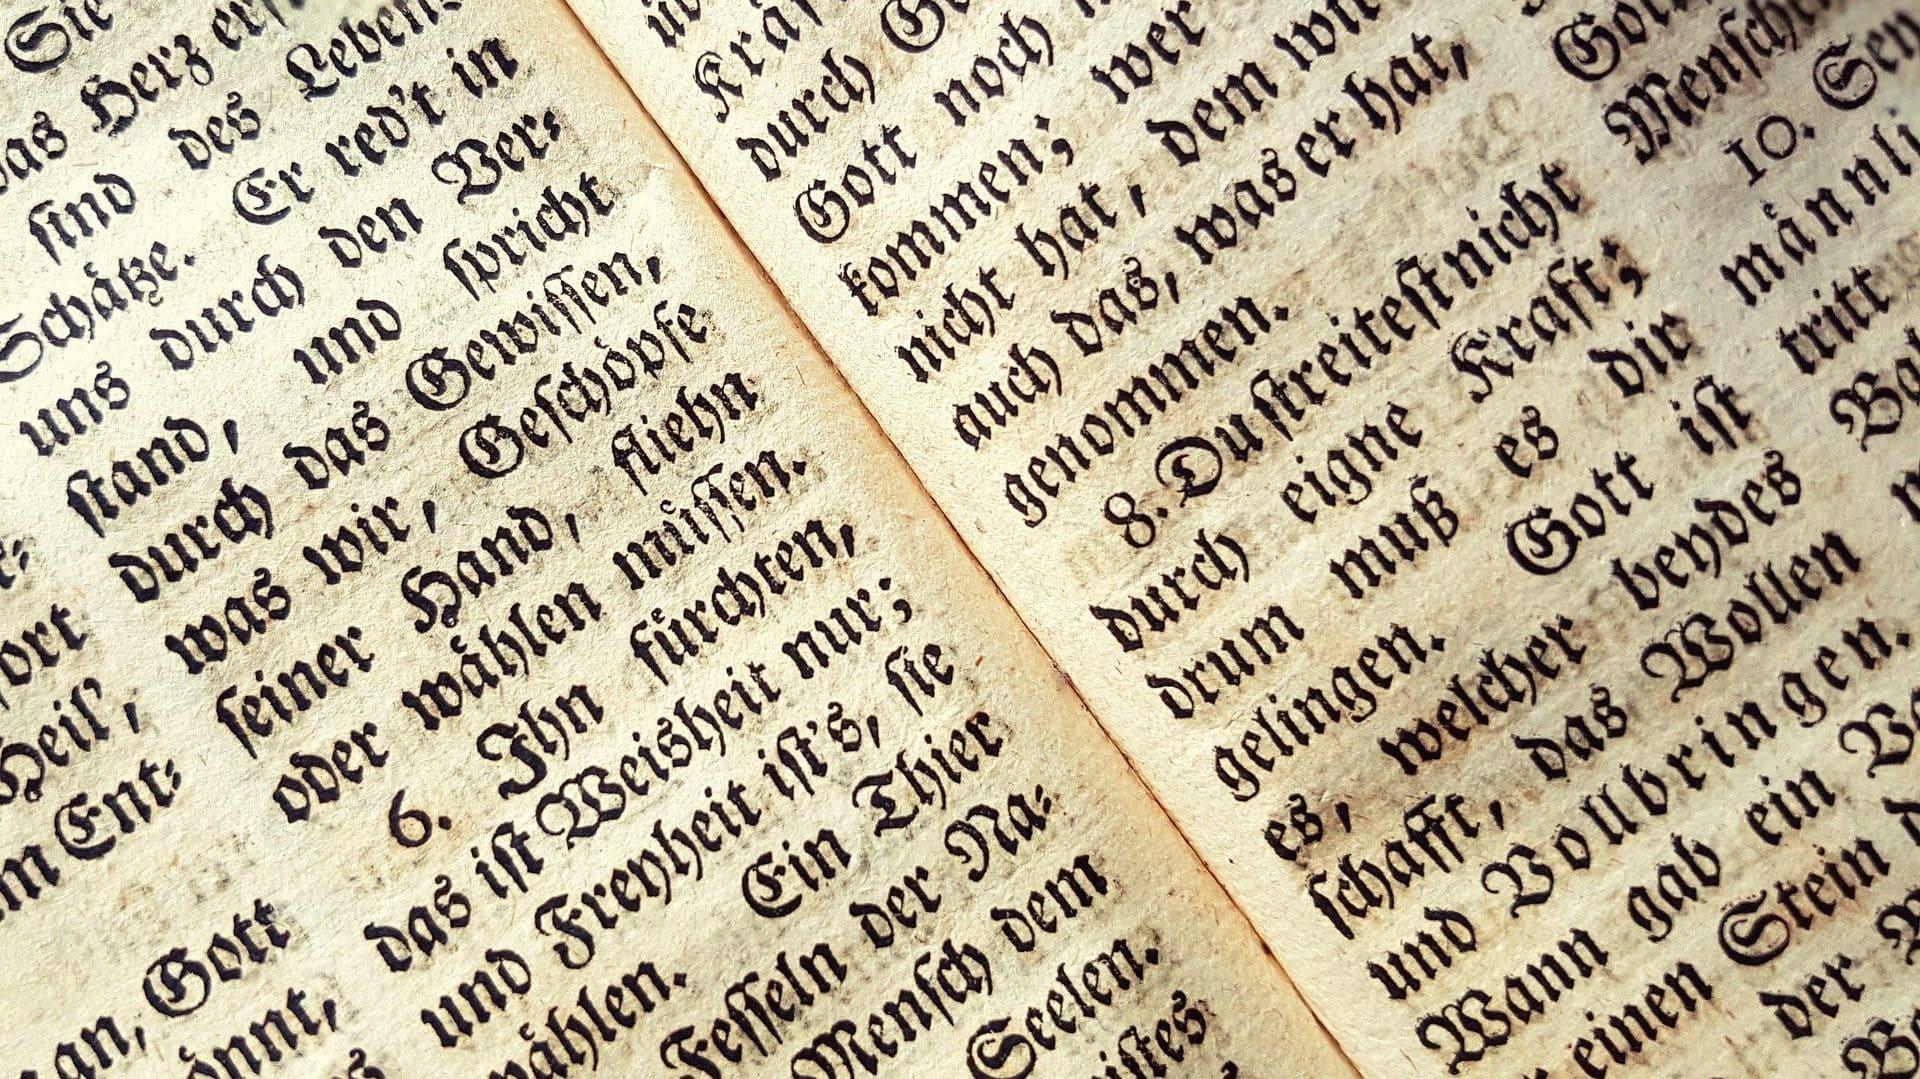 Oud schrift, bovenaanzicht